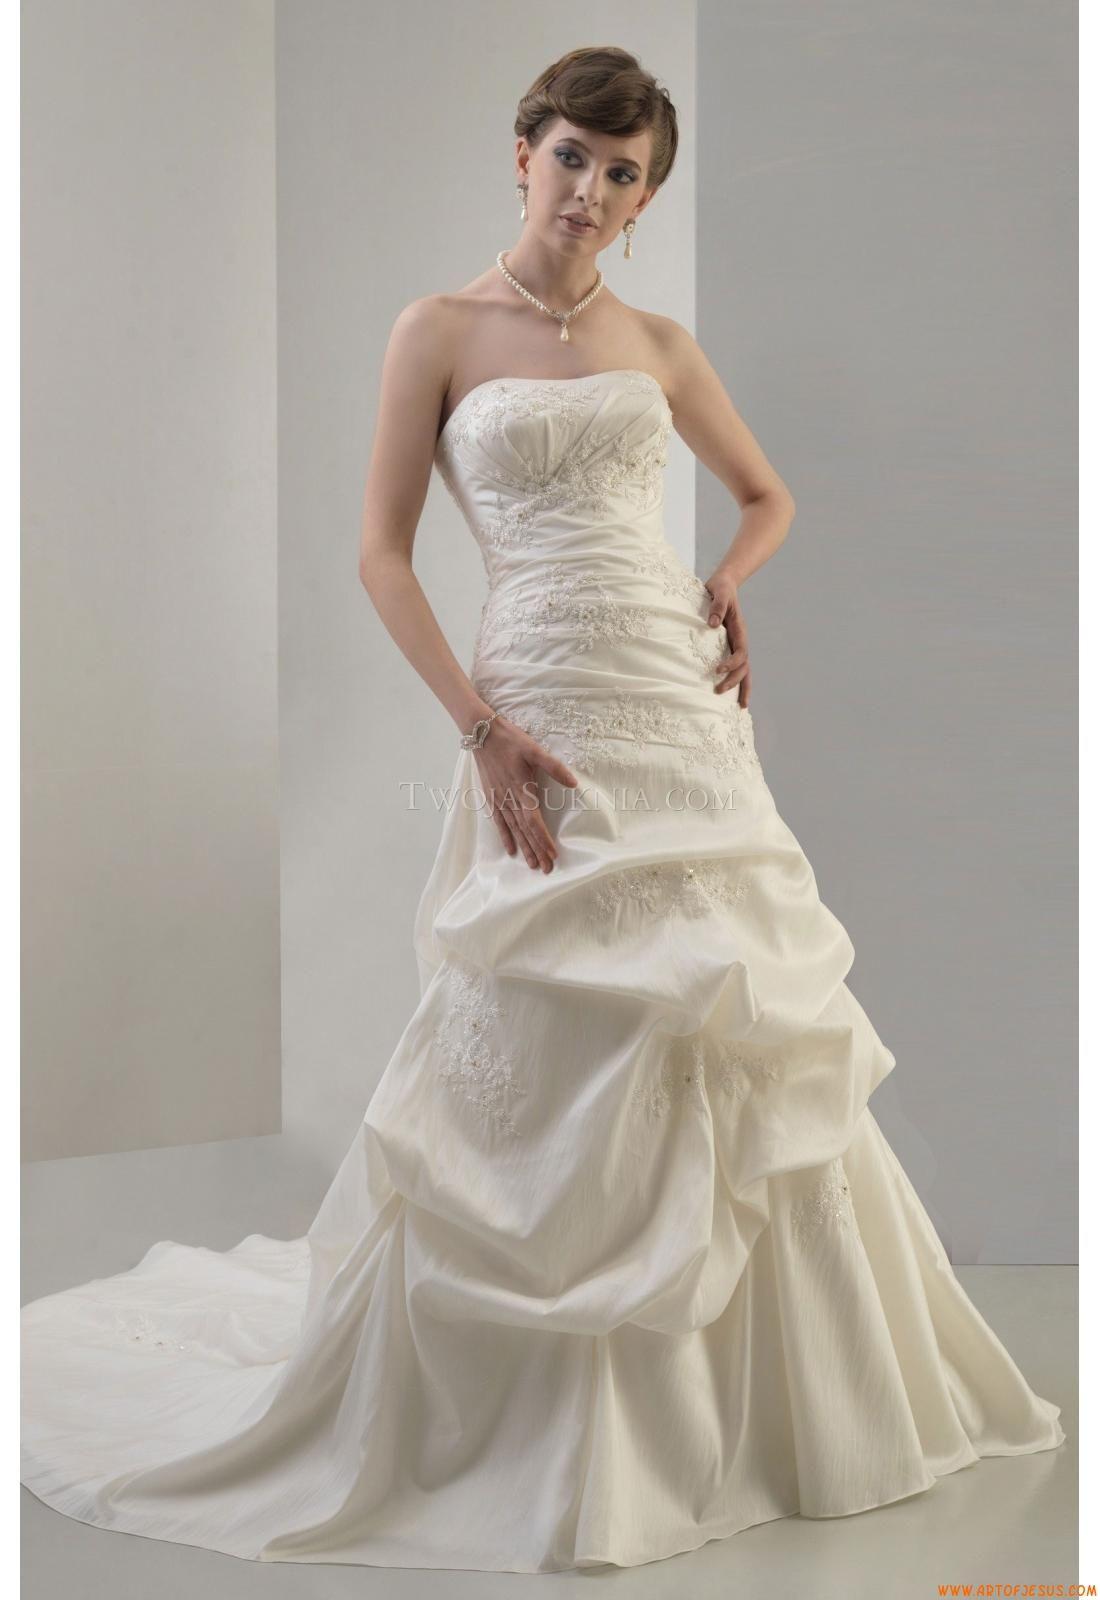 Elegant Strapless Court Train Unique Wedding Dress Venus AT4461 ...